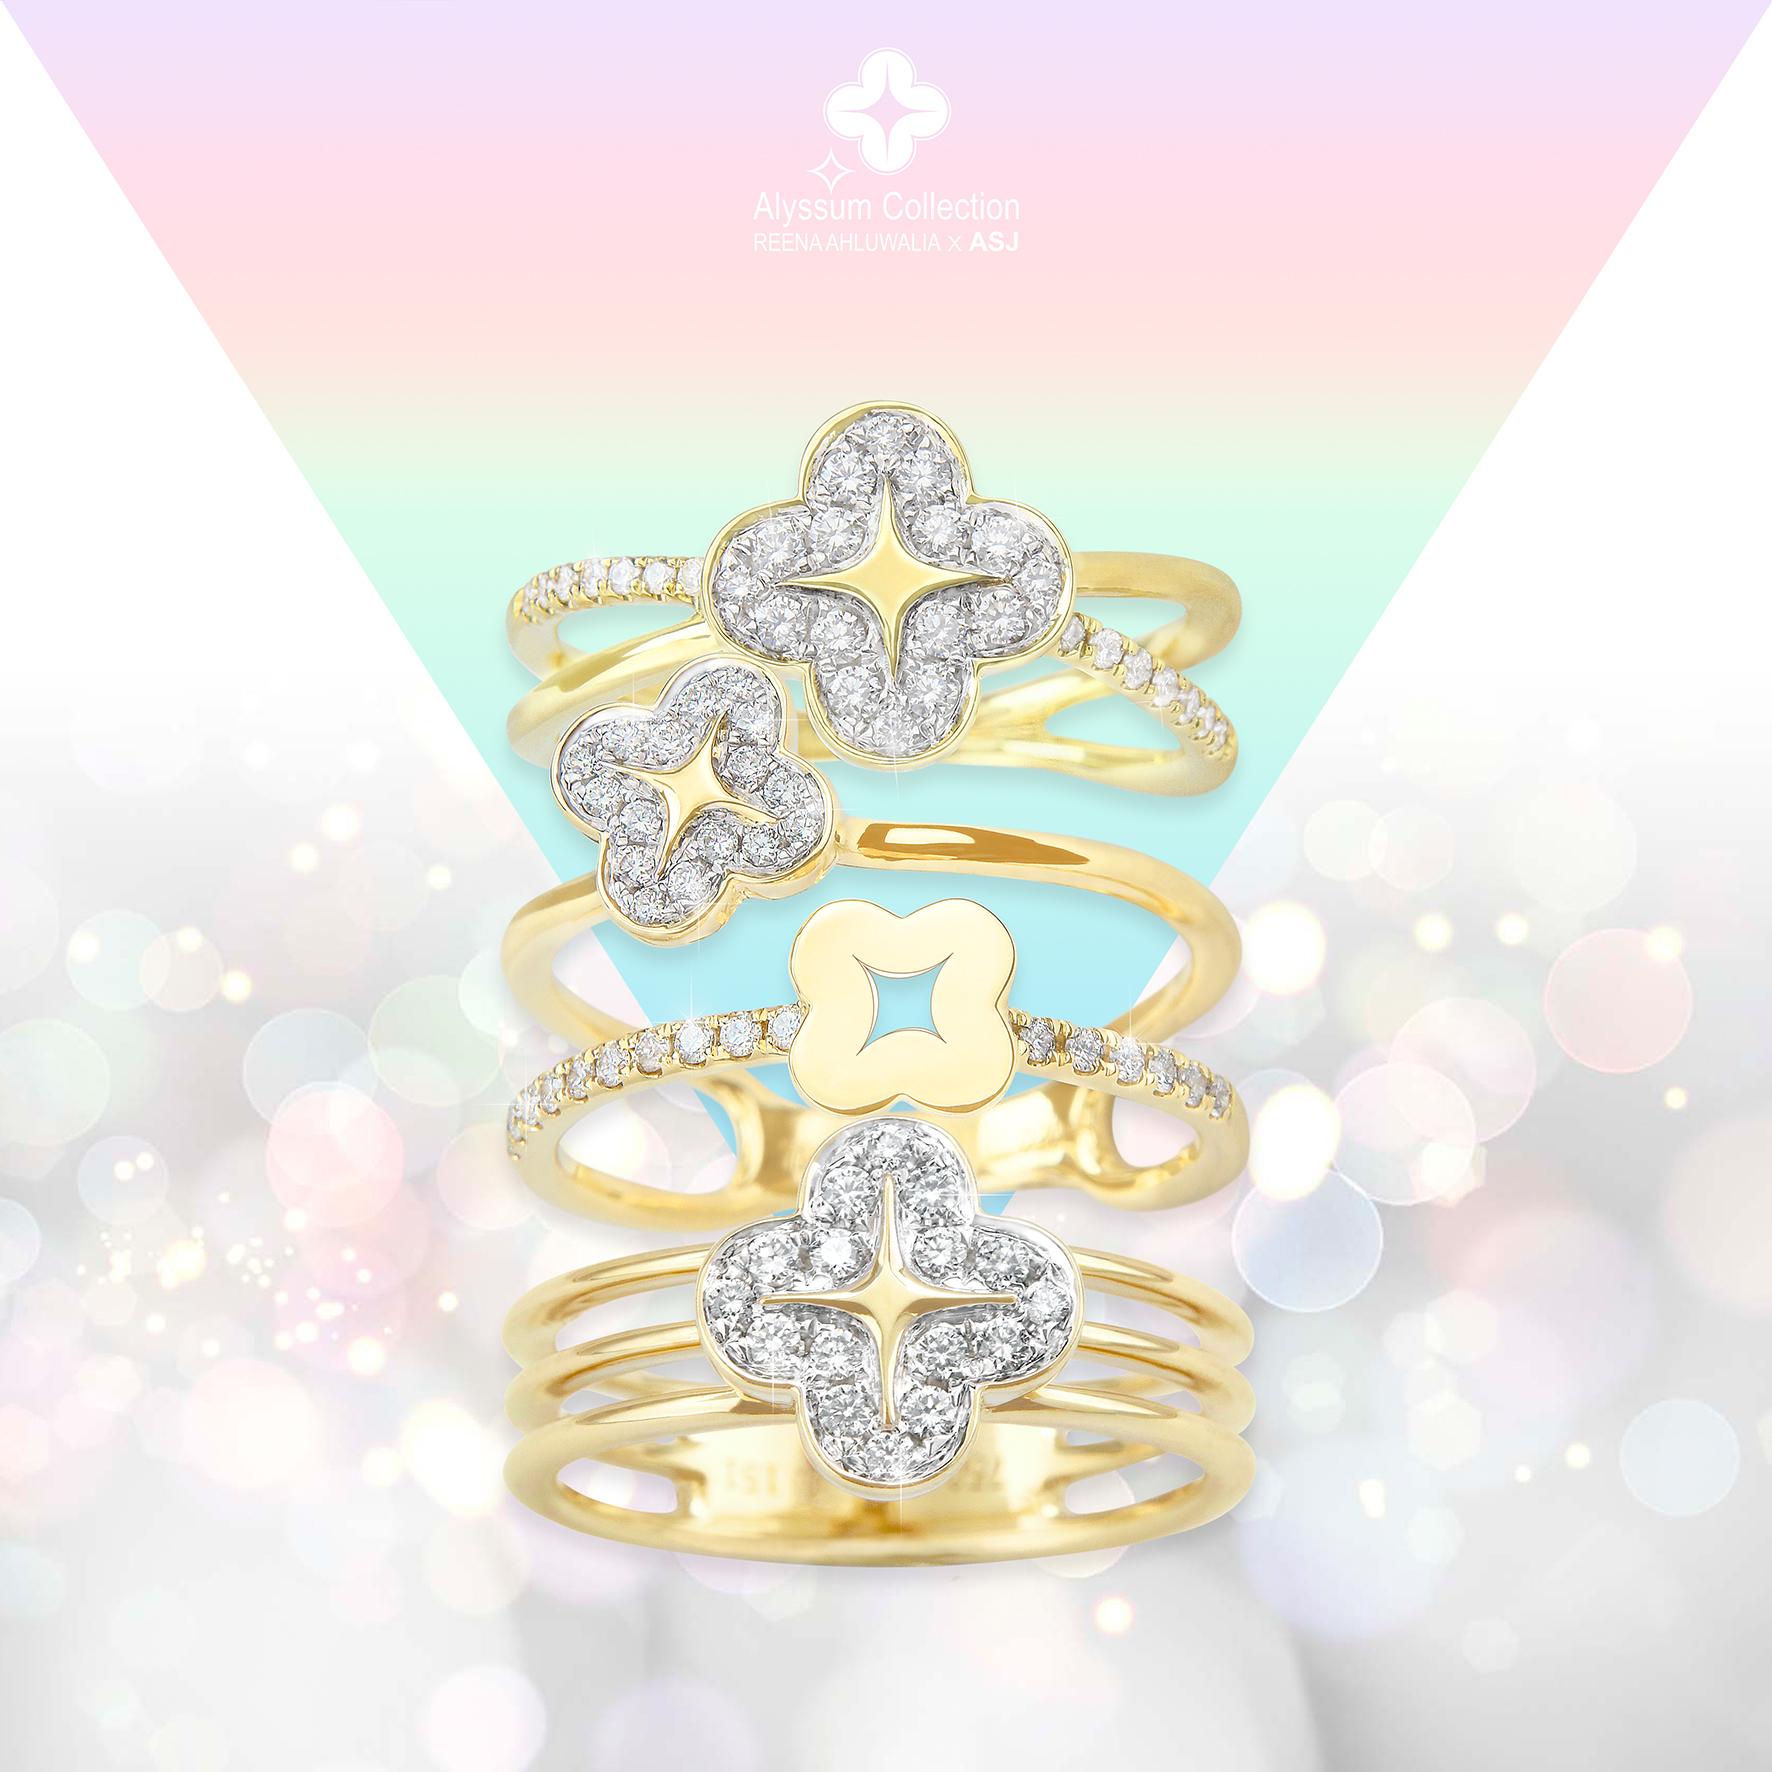 3Alyssum By Reena Ahluwalia_Diamonds_Gold_Collection.jpg